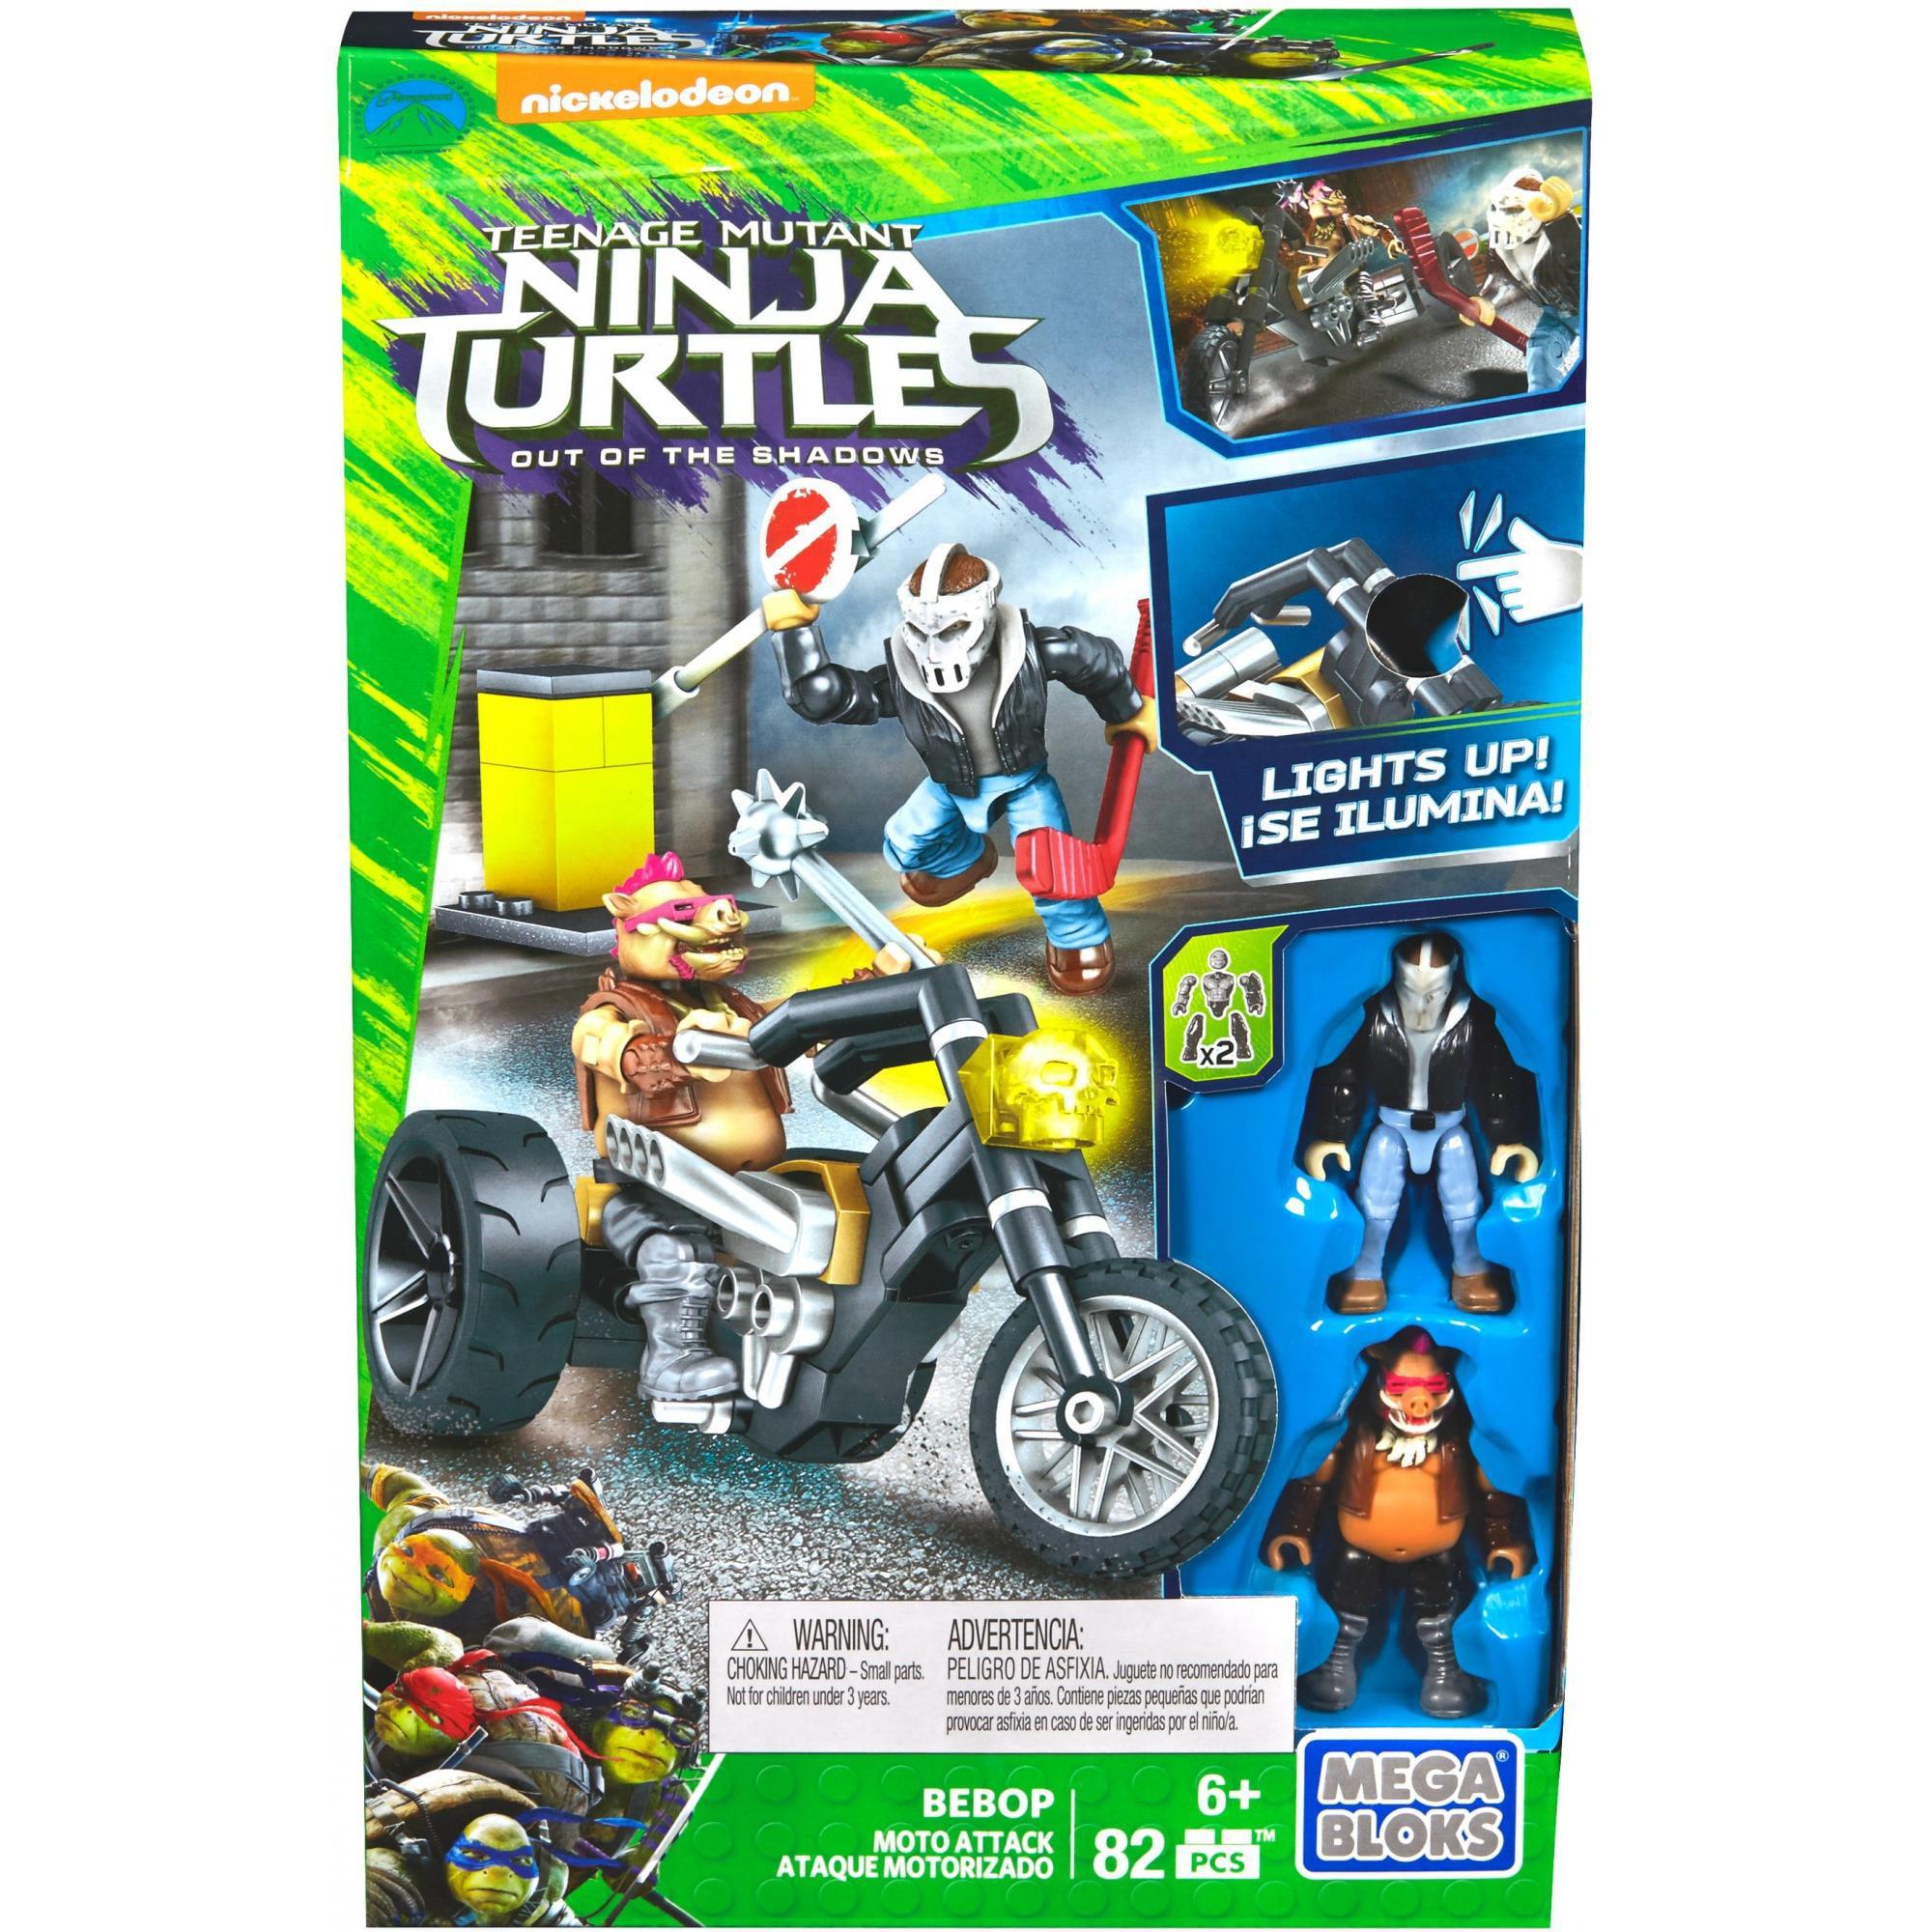 Mega Bloks Teenage Mutant Ninja Turtles Out of the Shadows Bebop Moto Attack by Mega Bloks